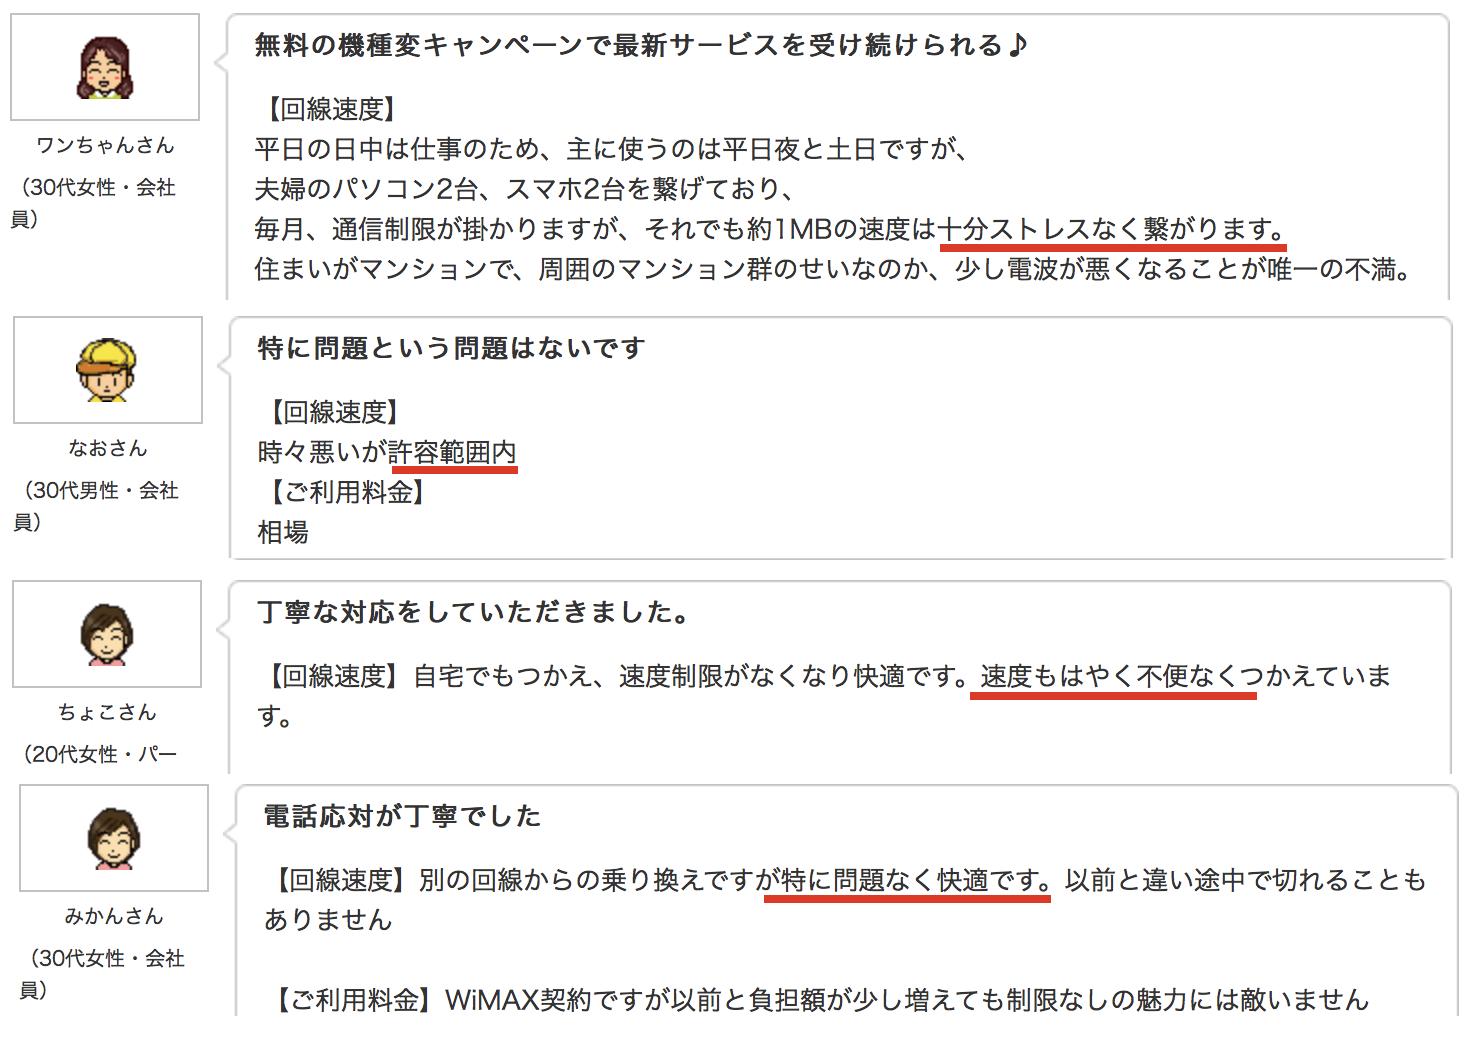 Q WiMAX 評判